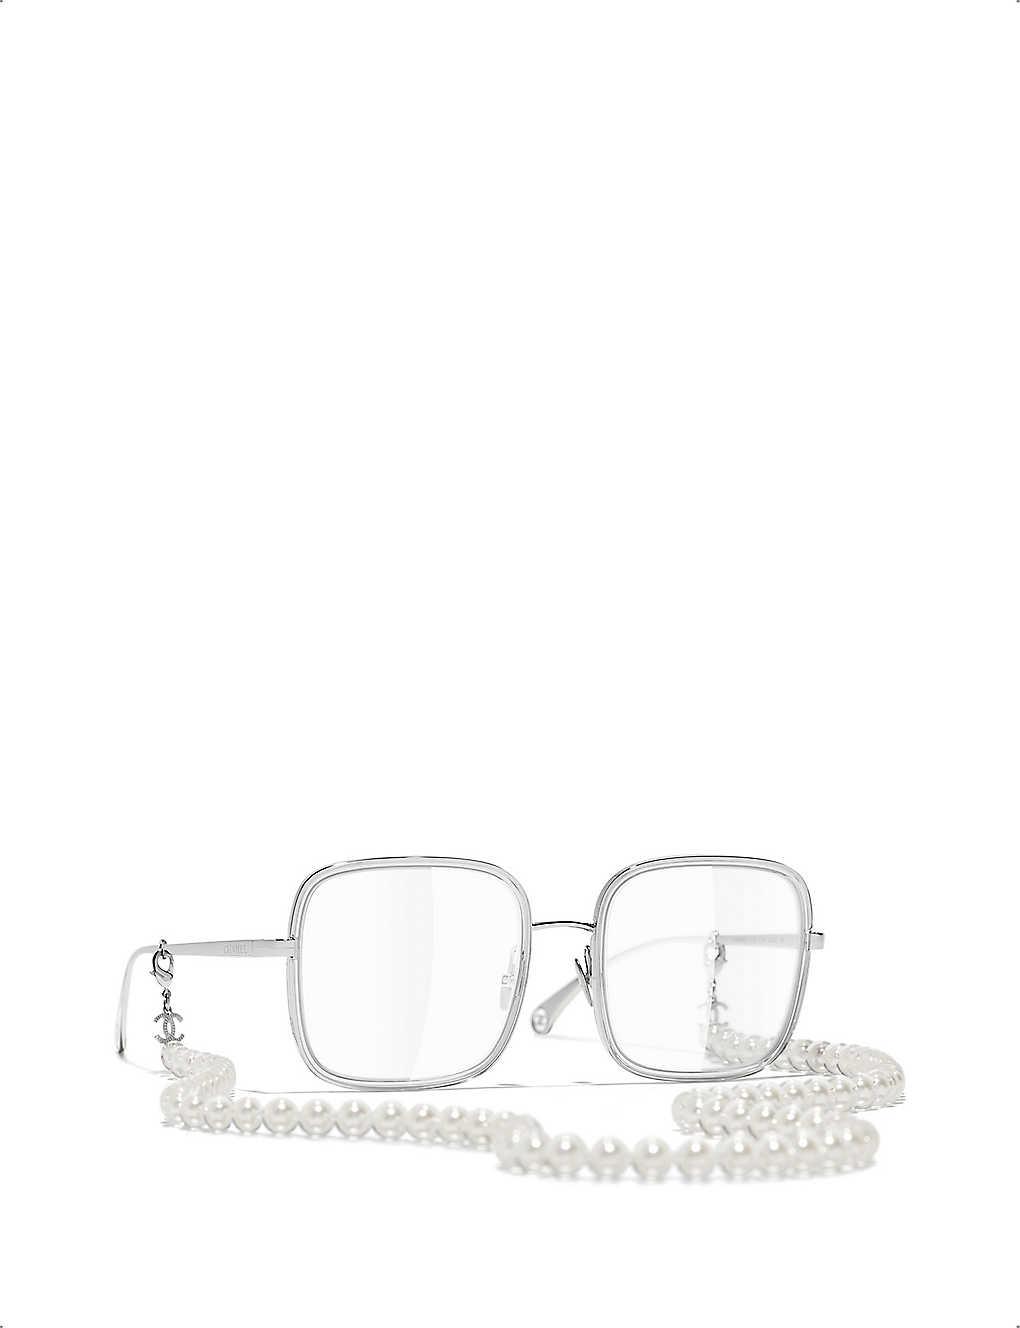 CHANEL: CH2195 pearl chain square-frame glasses